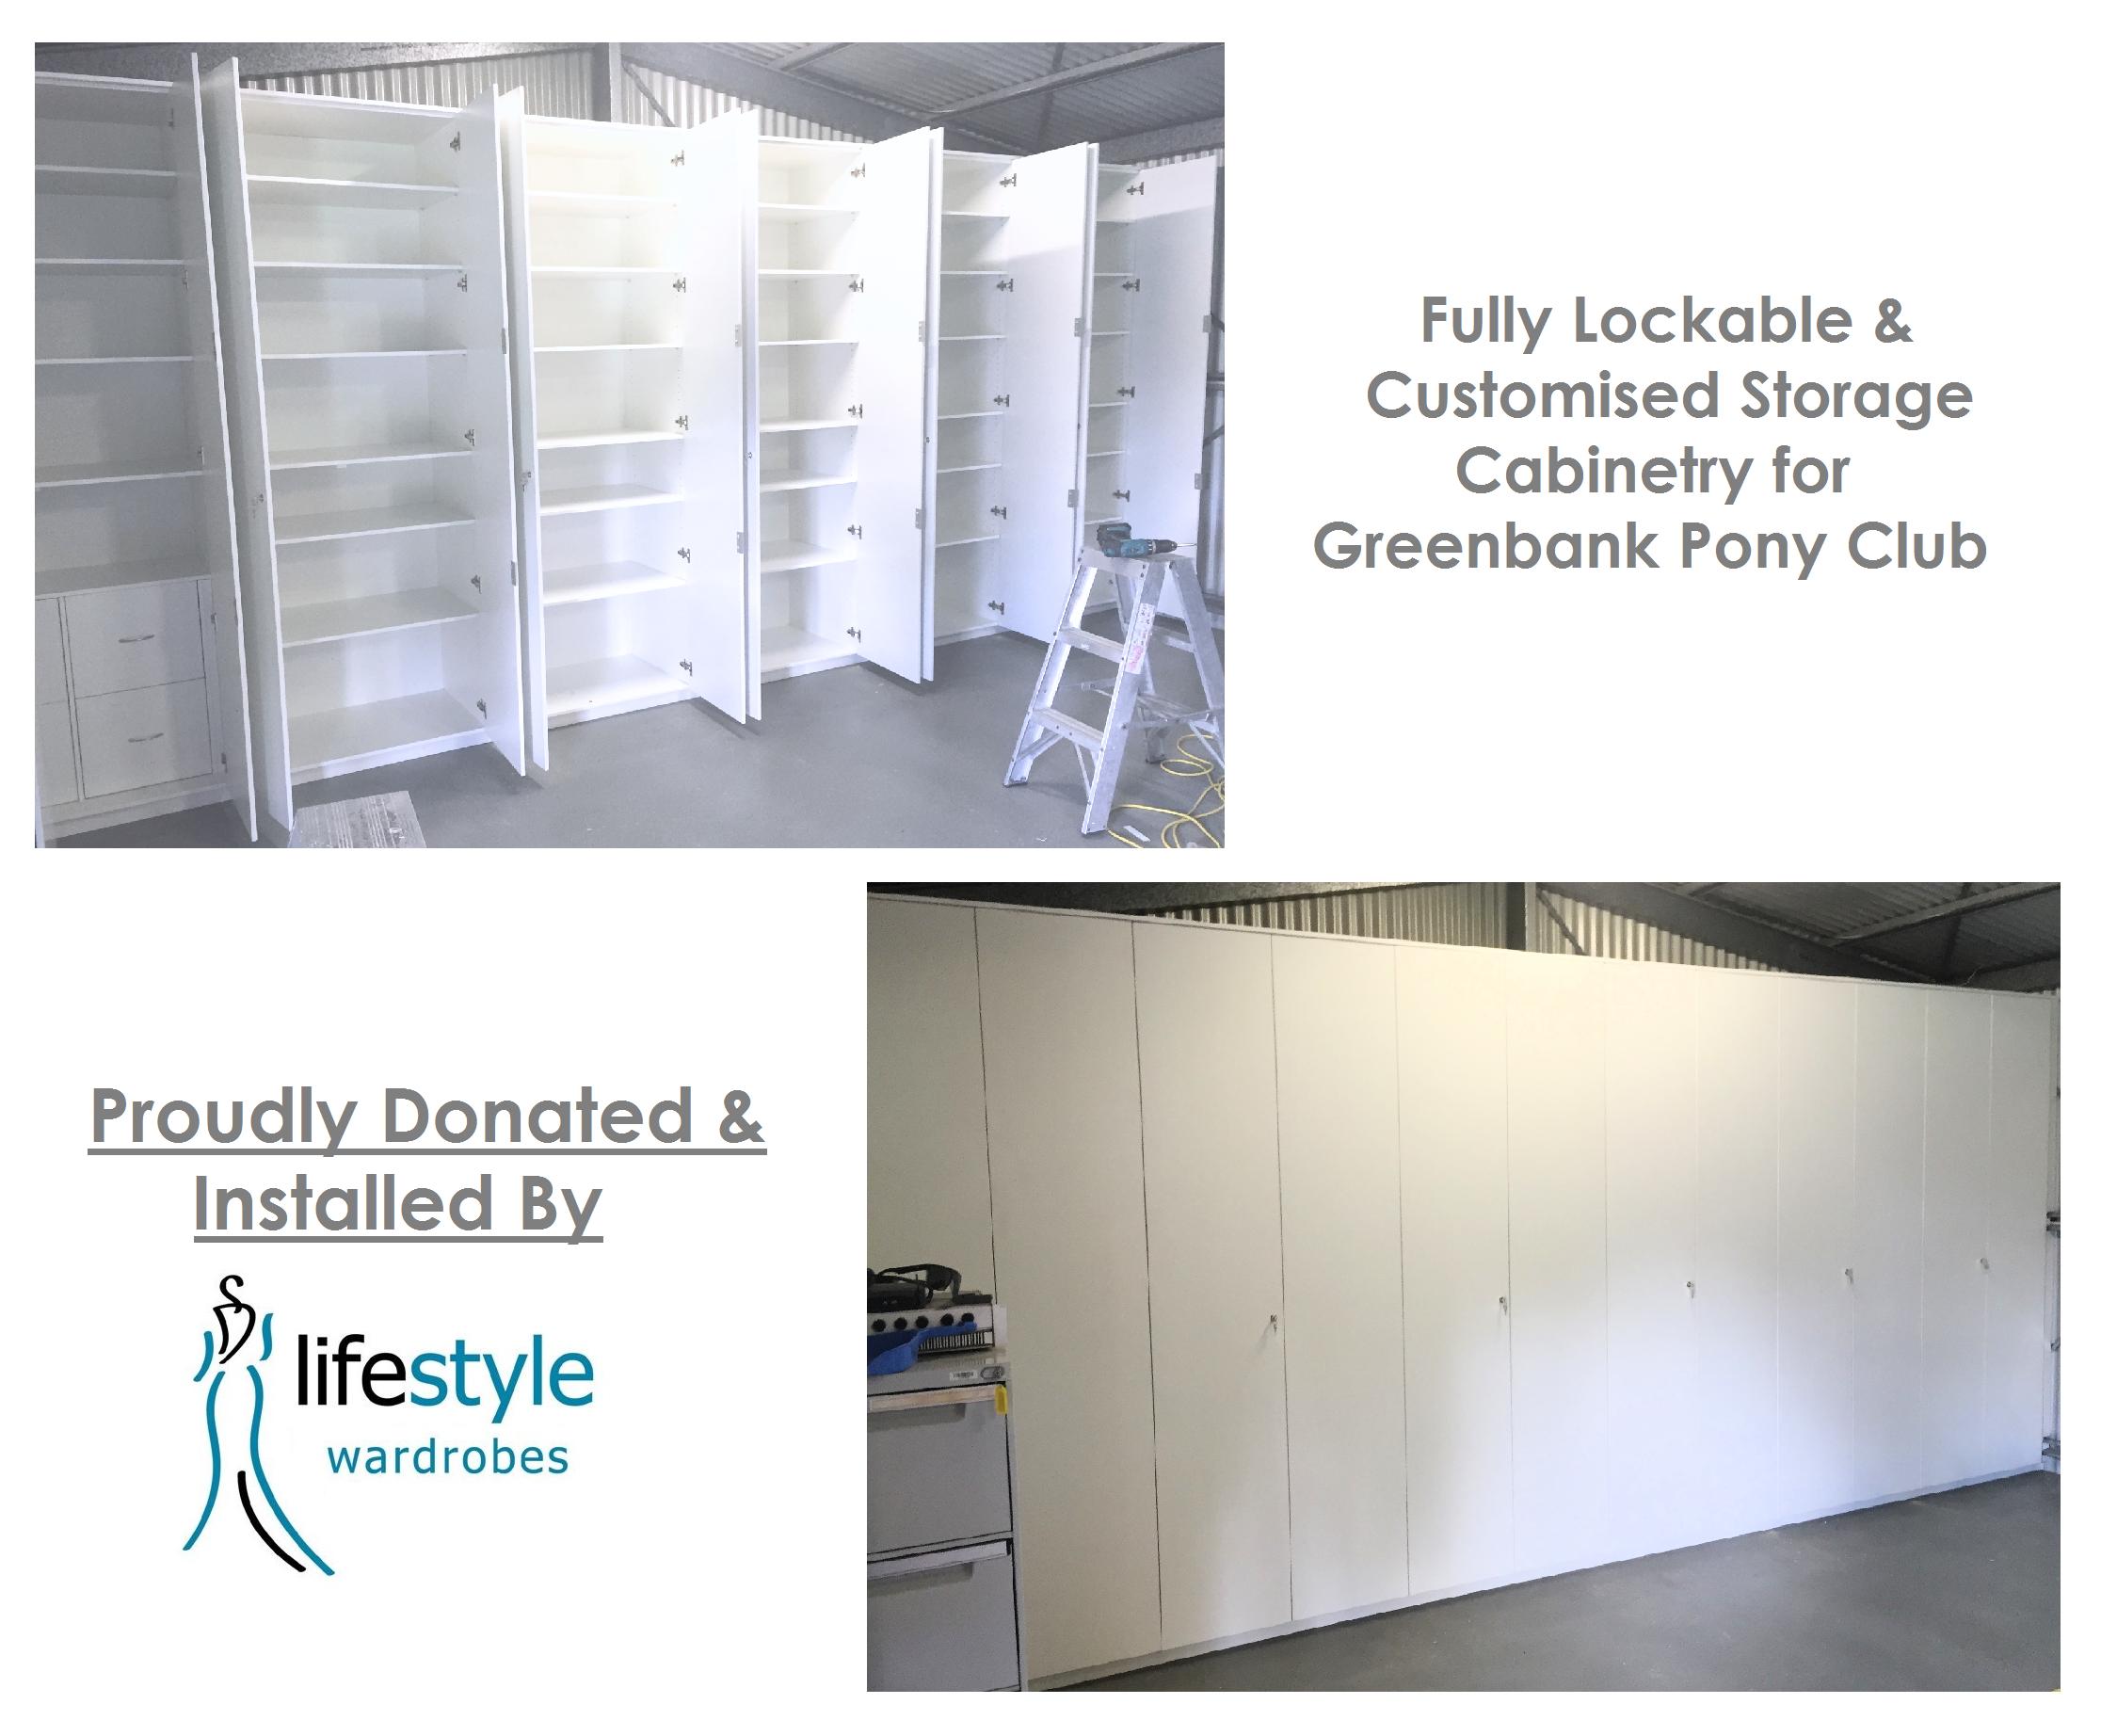 white rectangular cabinets